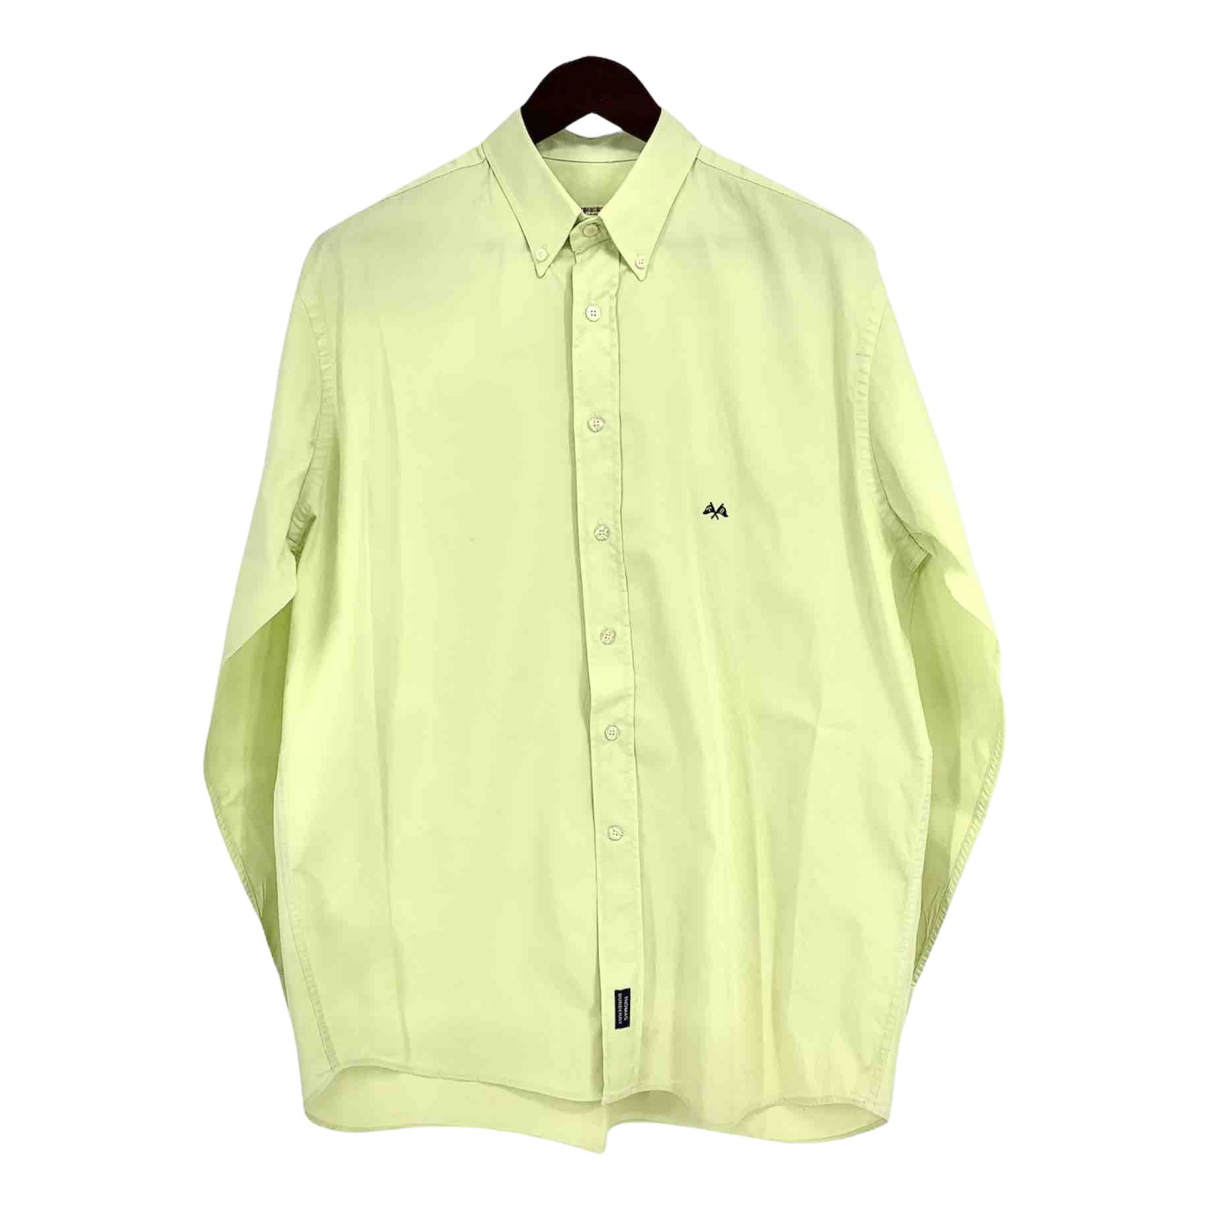 Burberry N Green Cotton Shirts for Men L International